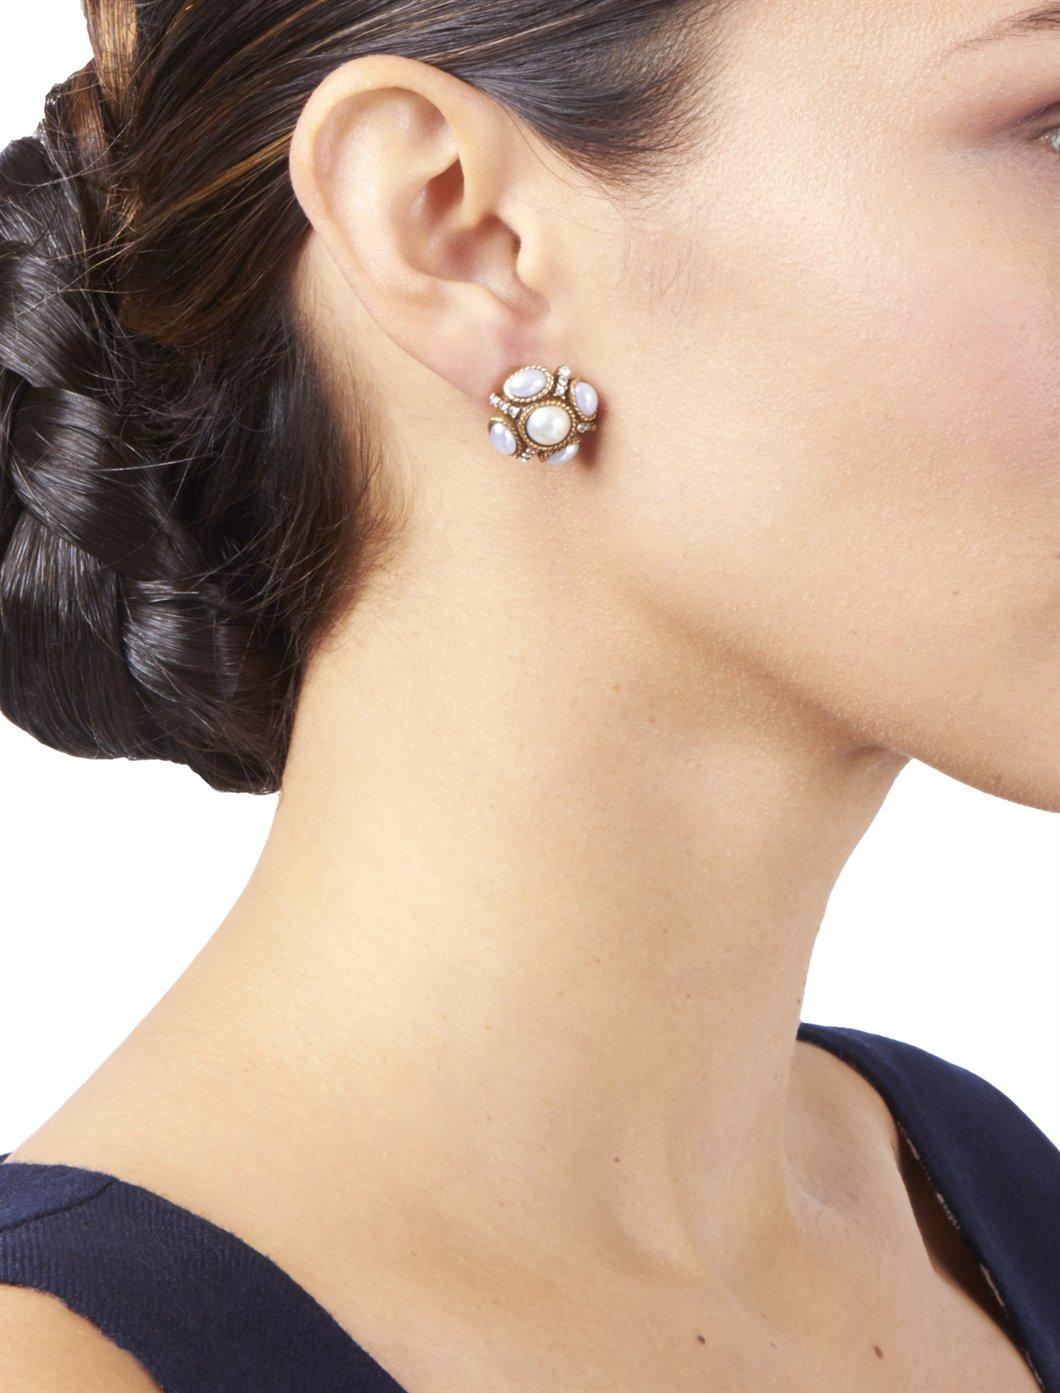 Oscar De La Renta Classic Crystal Button Earrings tBWSy